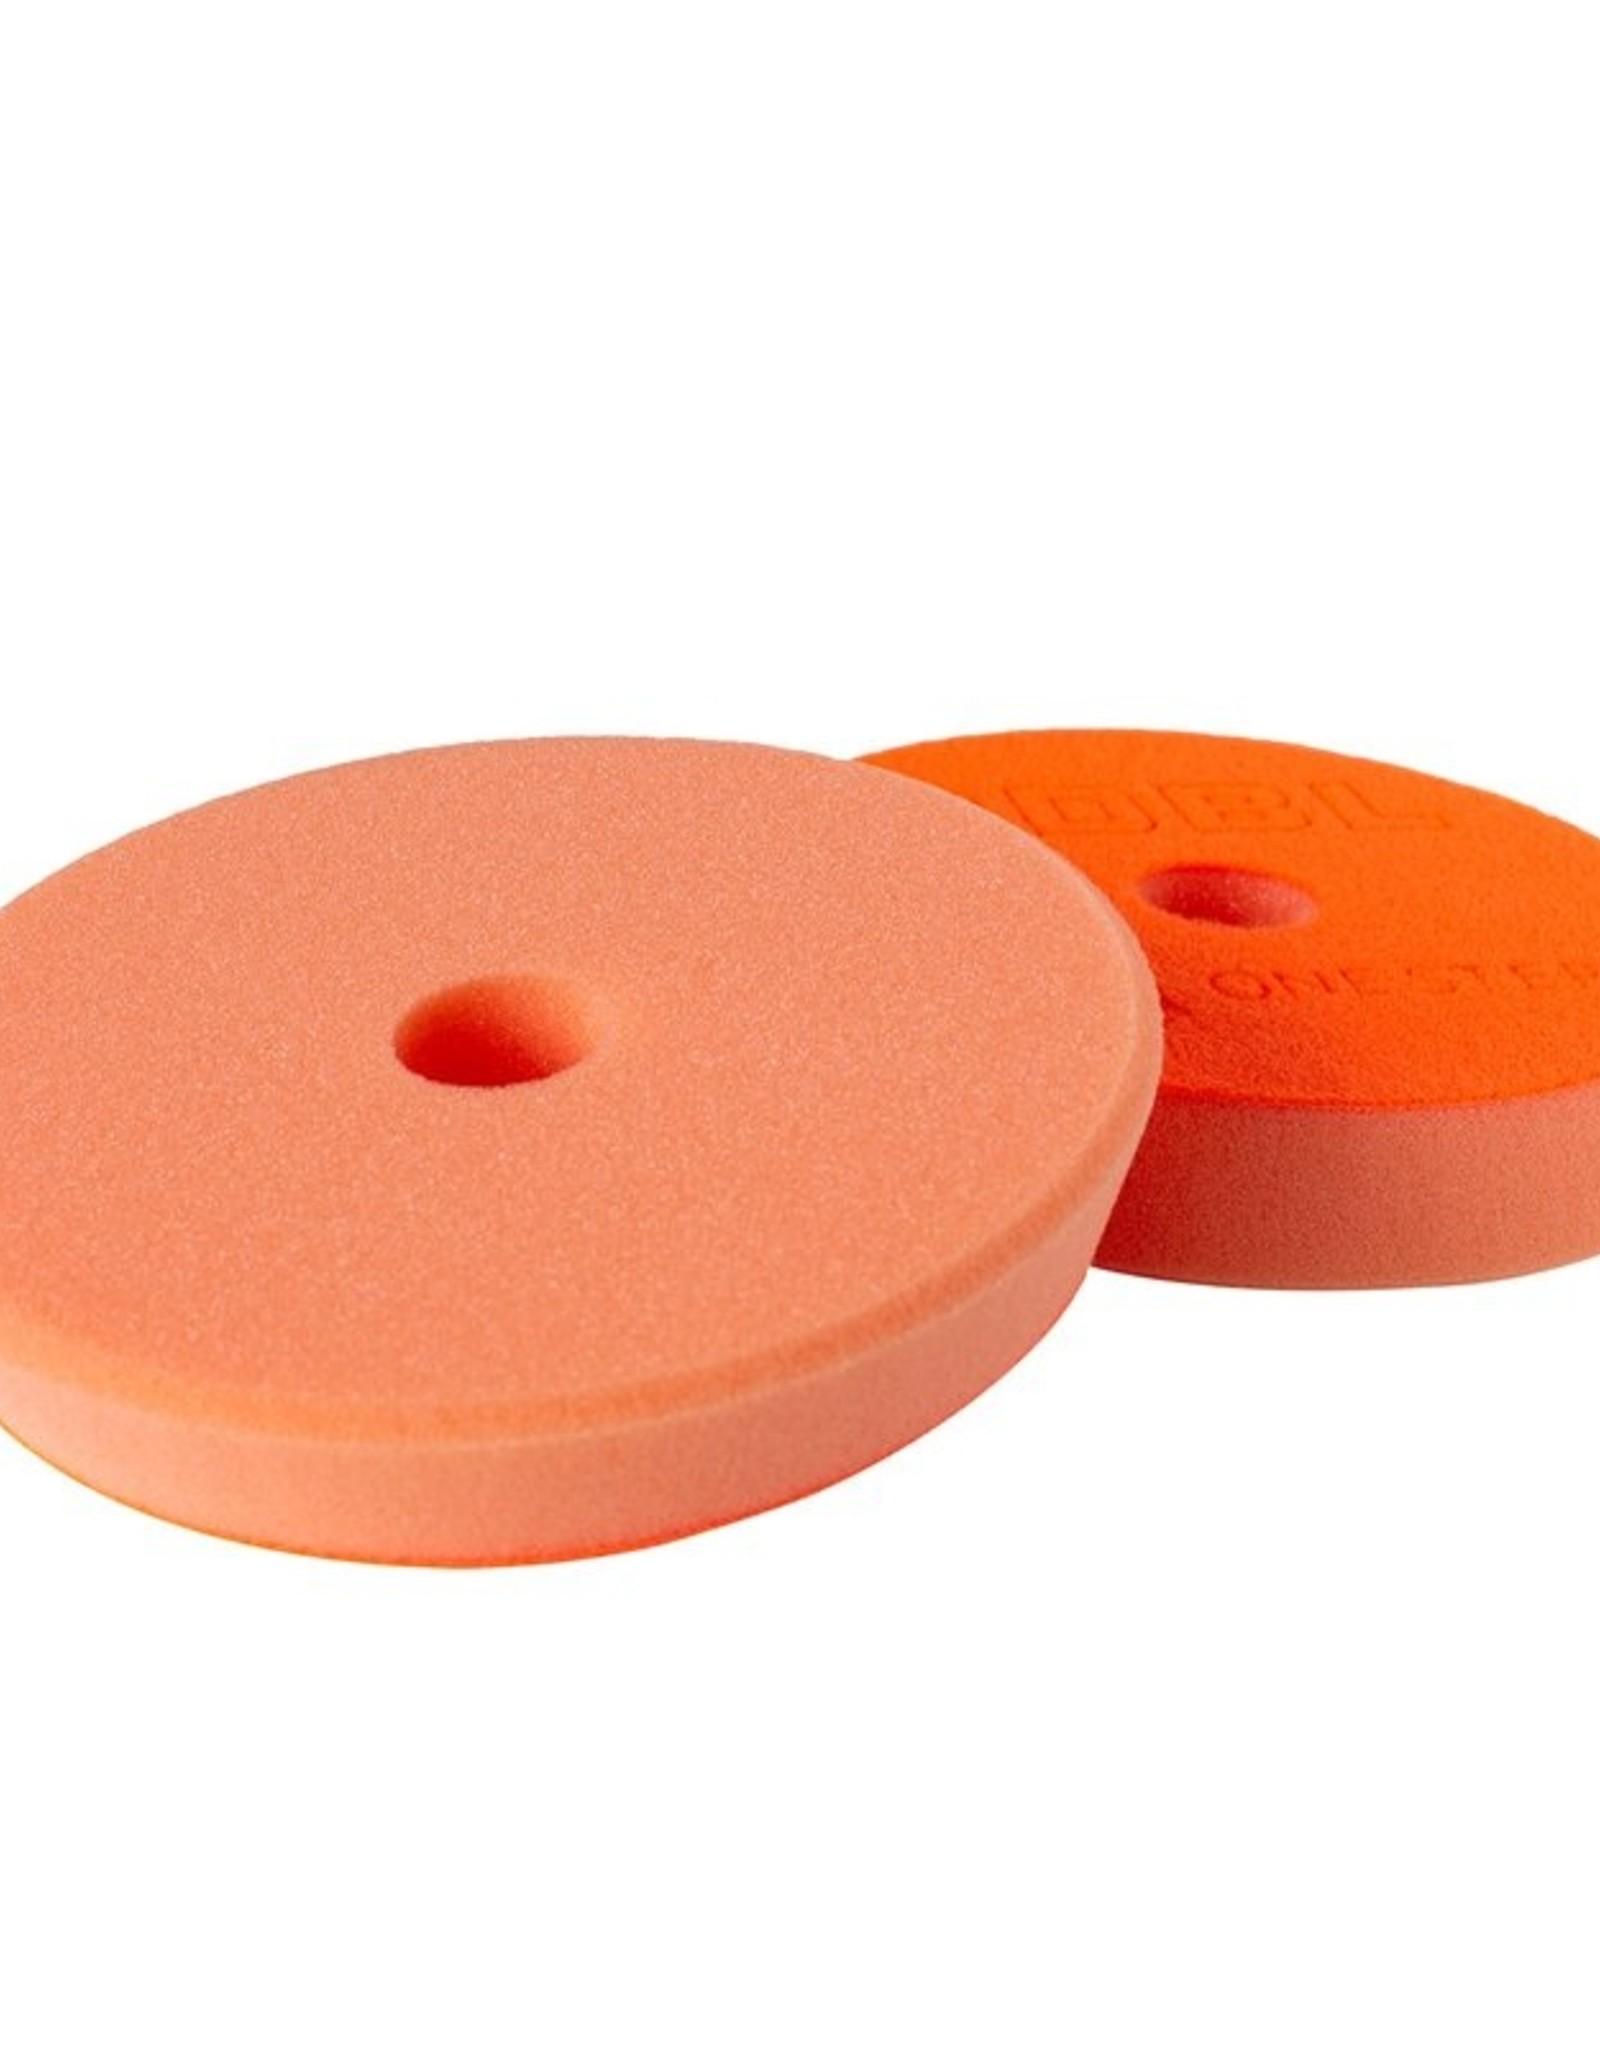 ADBL Roller Pad DA One Step 125mm